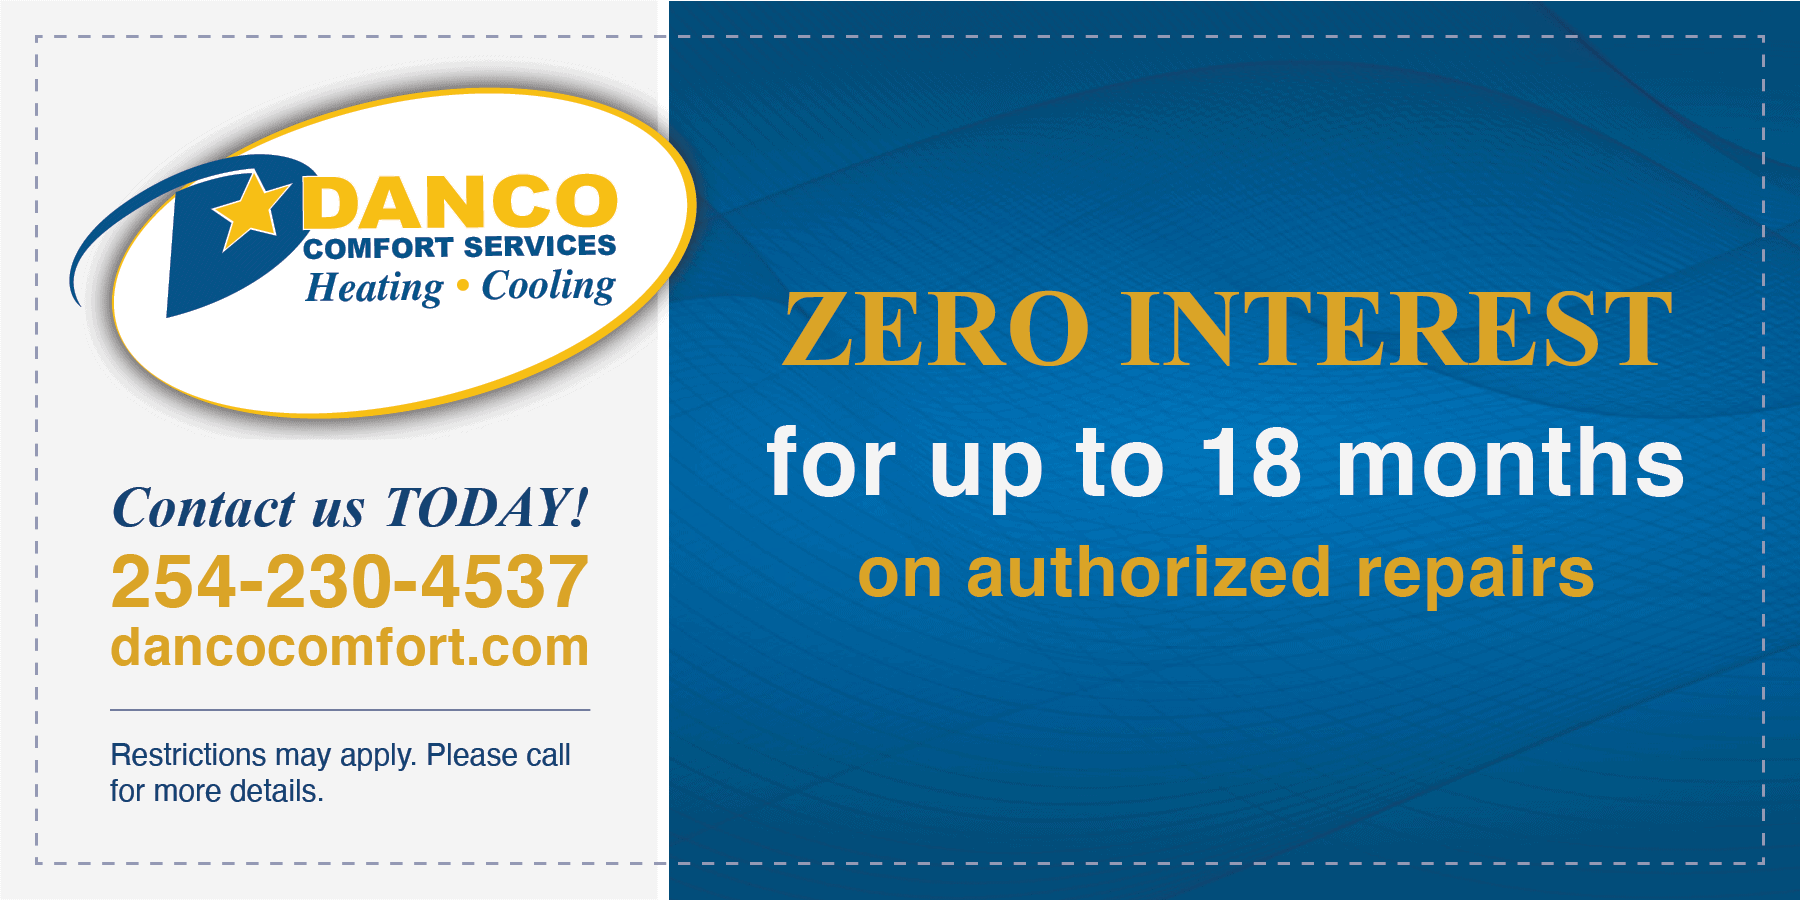 DSC-18-financing-coupon